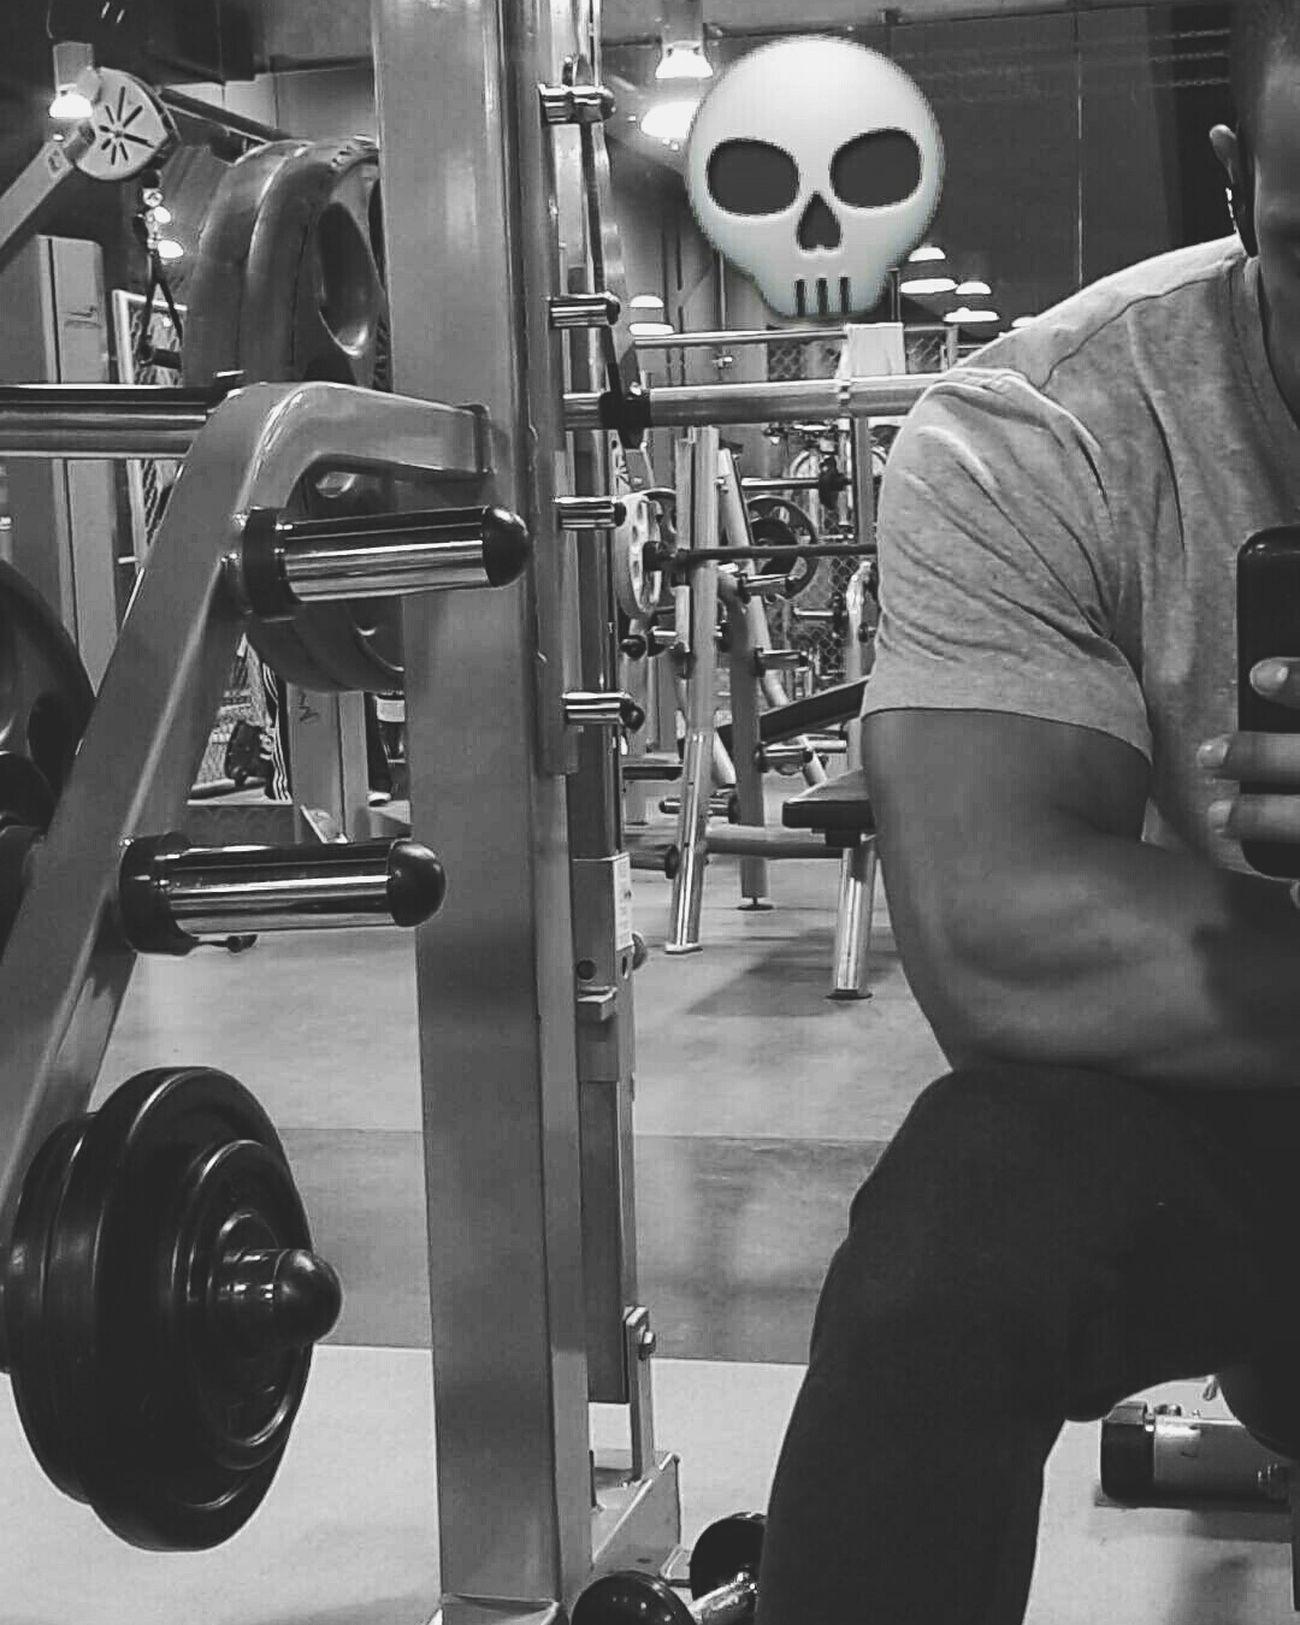 Workout Gym Fitness Cardio Bodybuilding كمال_اجسام لياقة رياضه  تمرين Blackandwhite